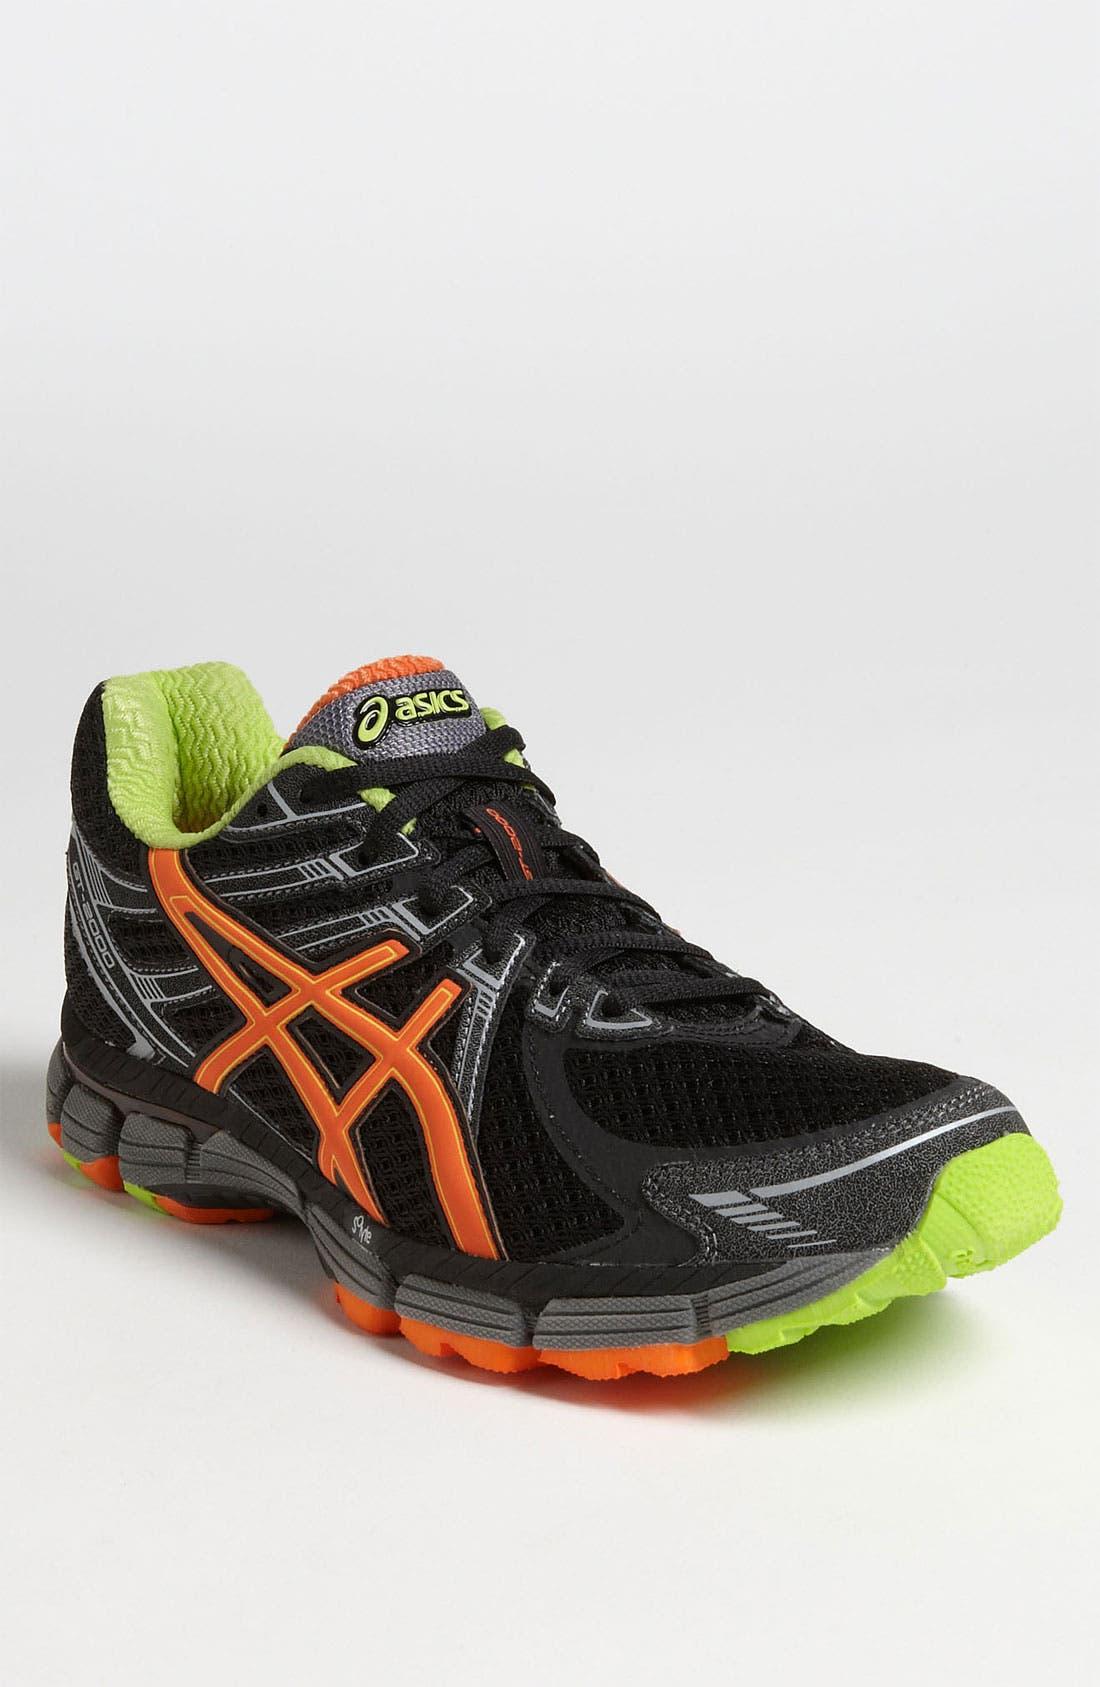 Main Image - ASICS® 'GT 2000' Trail Running Shoe (Men) (Online Only)